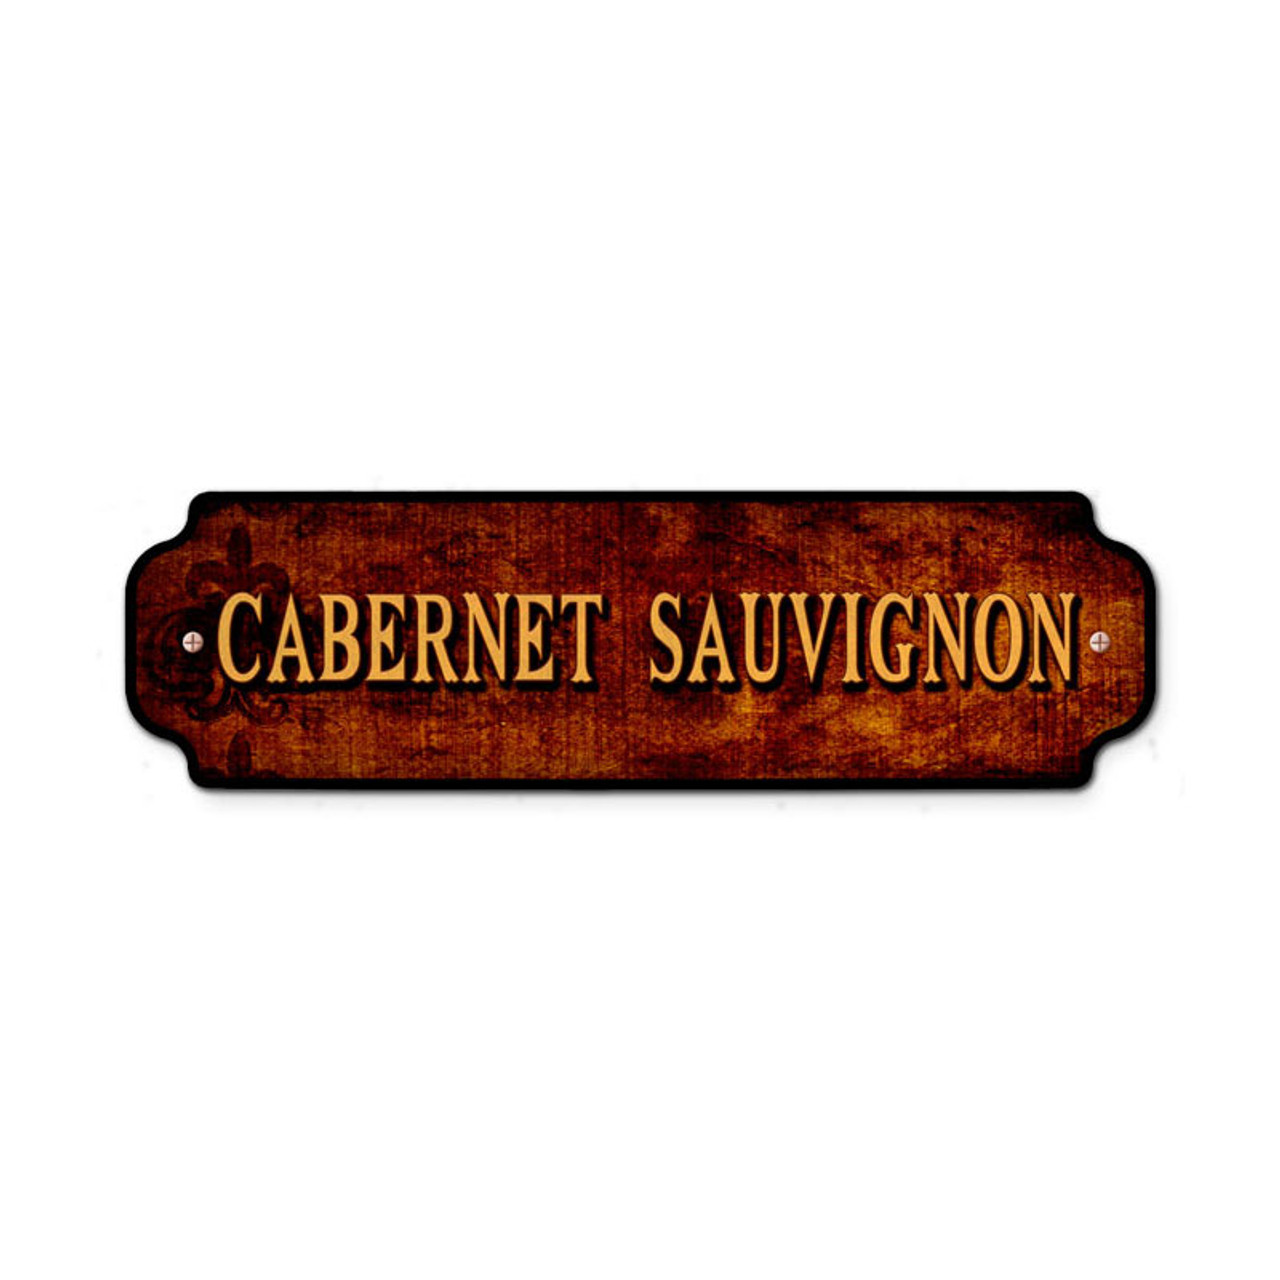 Vintage Cabernet Sauvignon Door Push 12 x 3 Inches